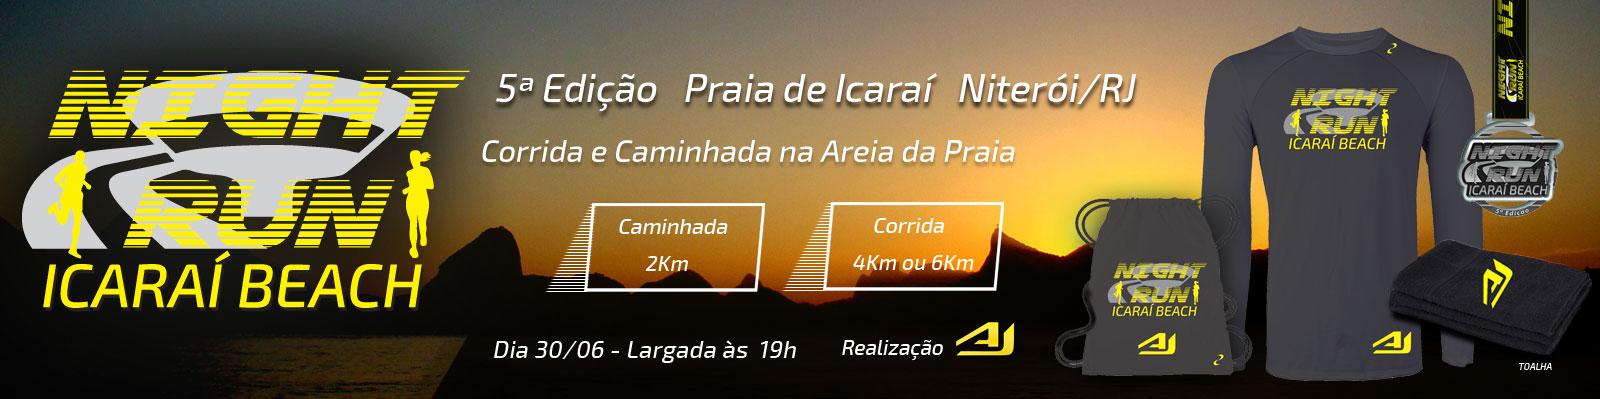 NIGHT RUN ICARAÍ BEACH - 5ª EDIÇÃO - NITERÓI/RJ - Imagem de topo